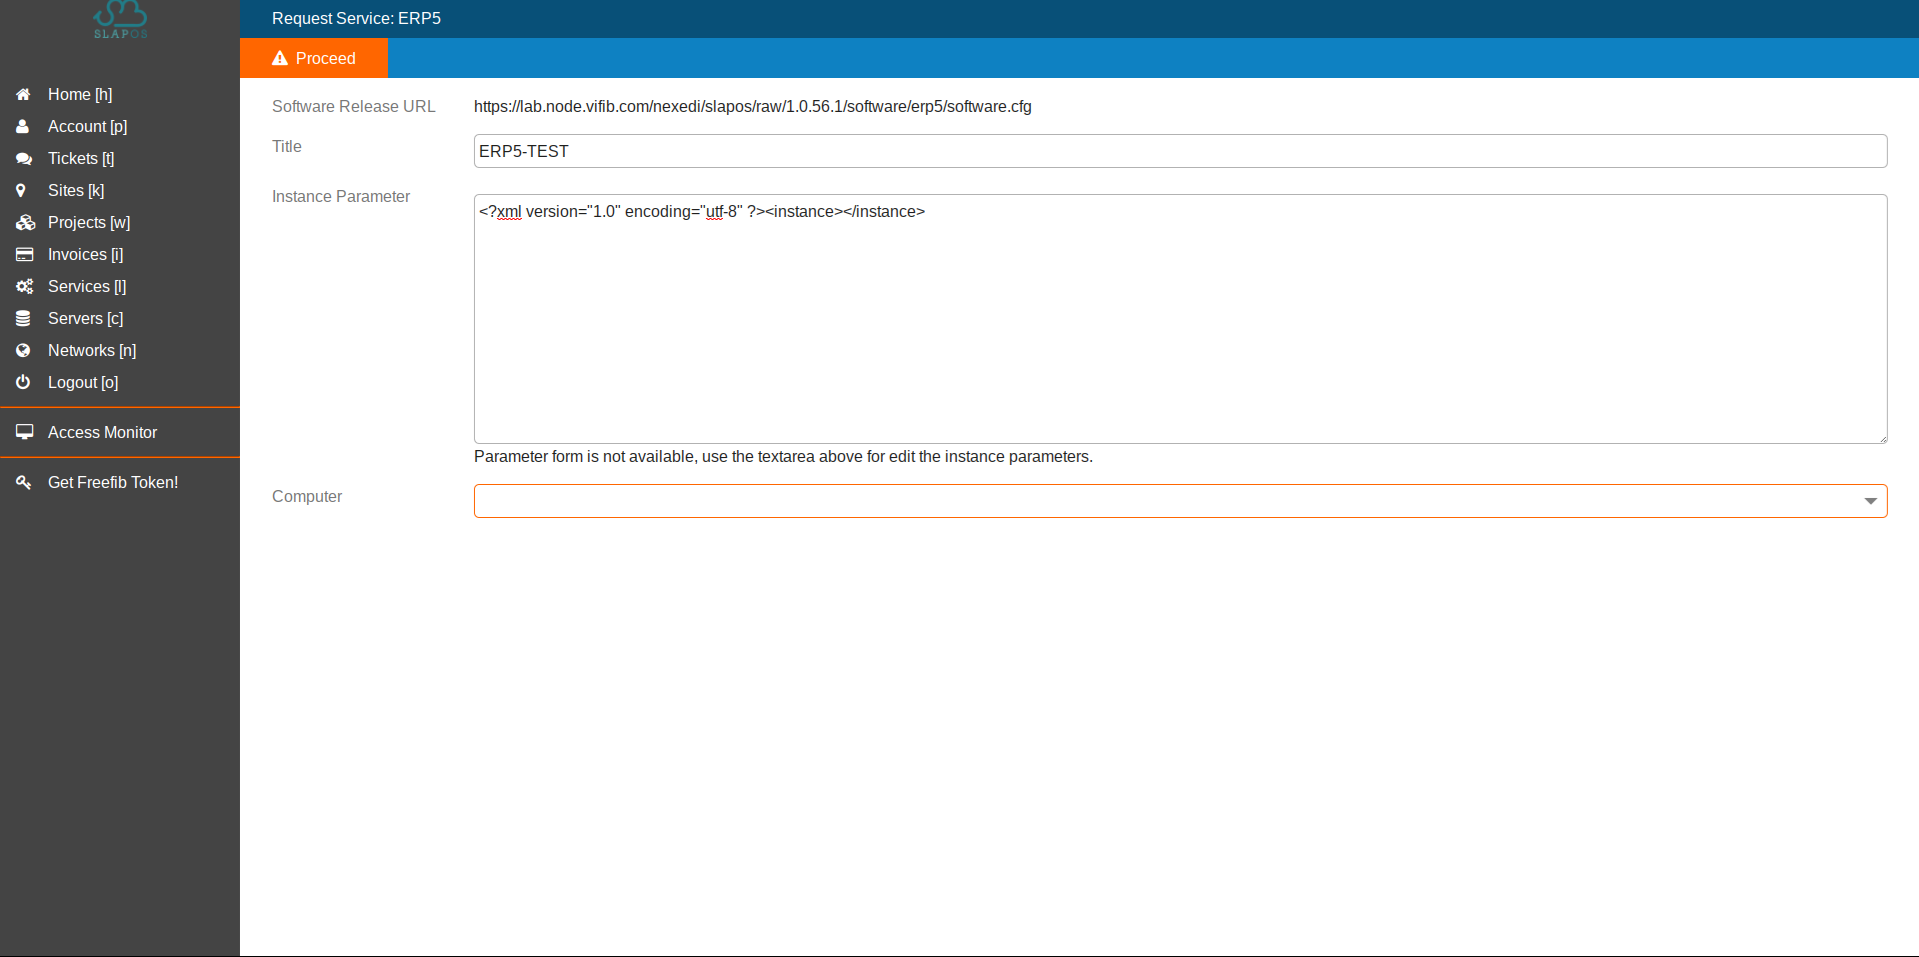 SlapOS Interface - ERP5 Configuration Parameters